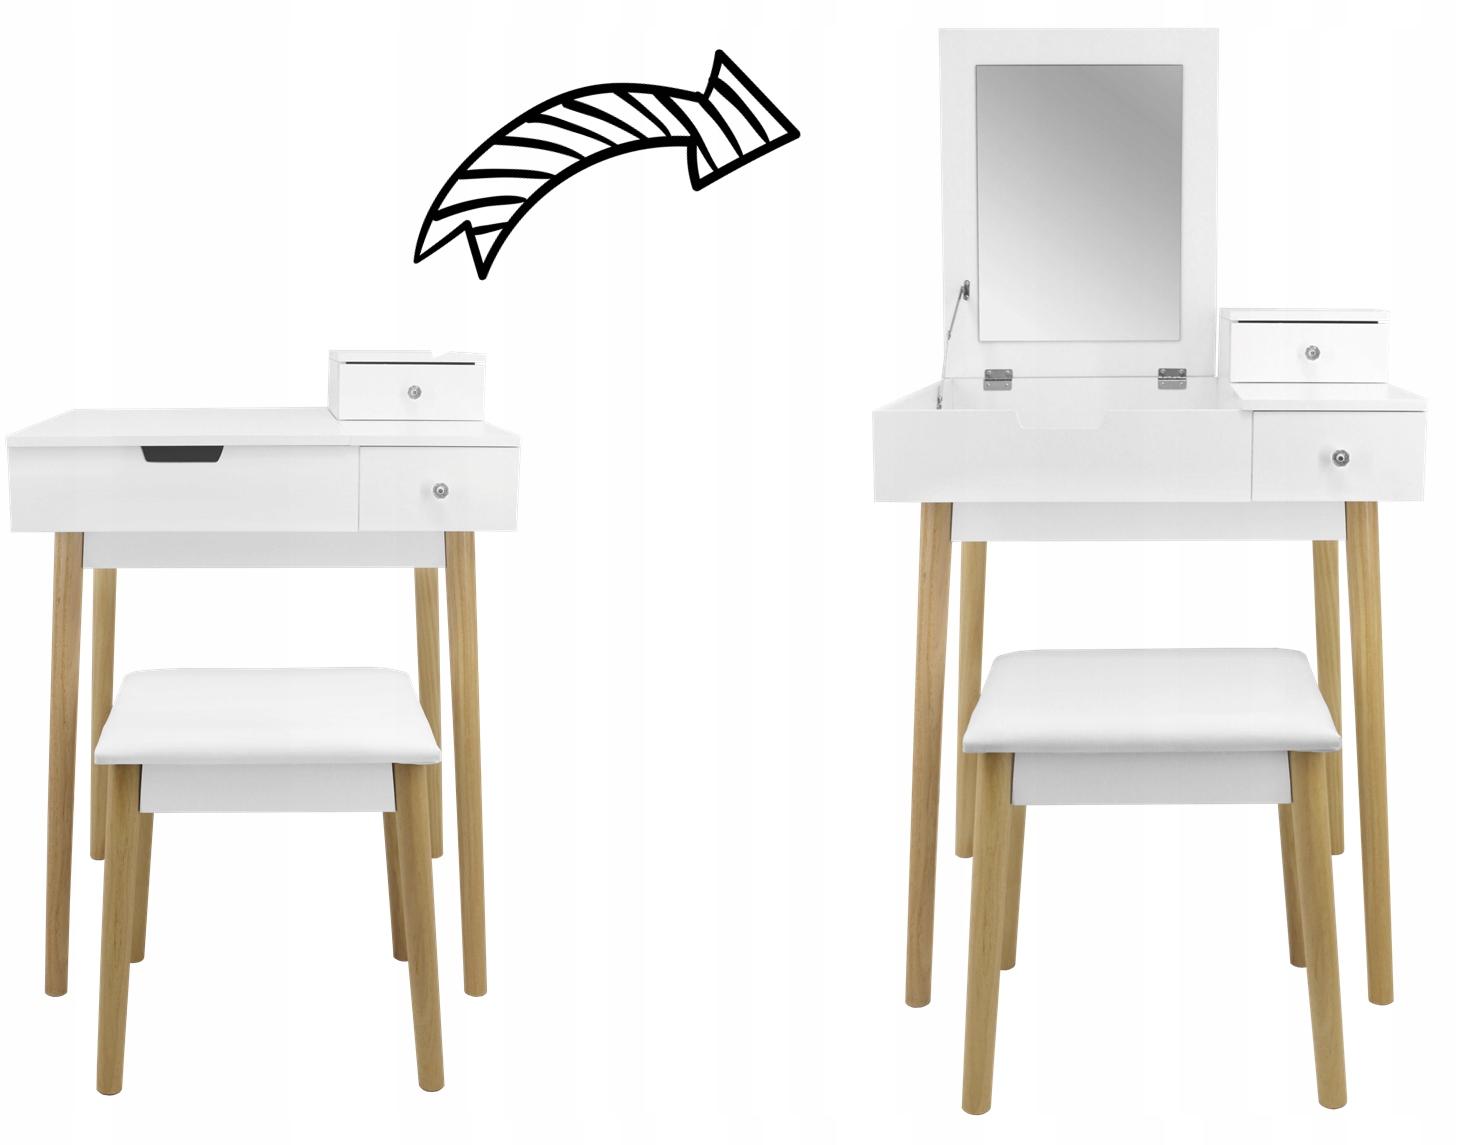 ТУАЛЕТ ДЛЯ МАКИЯЖА ЗЕРКАЛО БЕЛОЕ ДЕРЕВО + ТАРЕЛКА Глубина мебели 50,5 см.